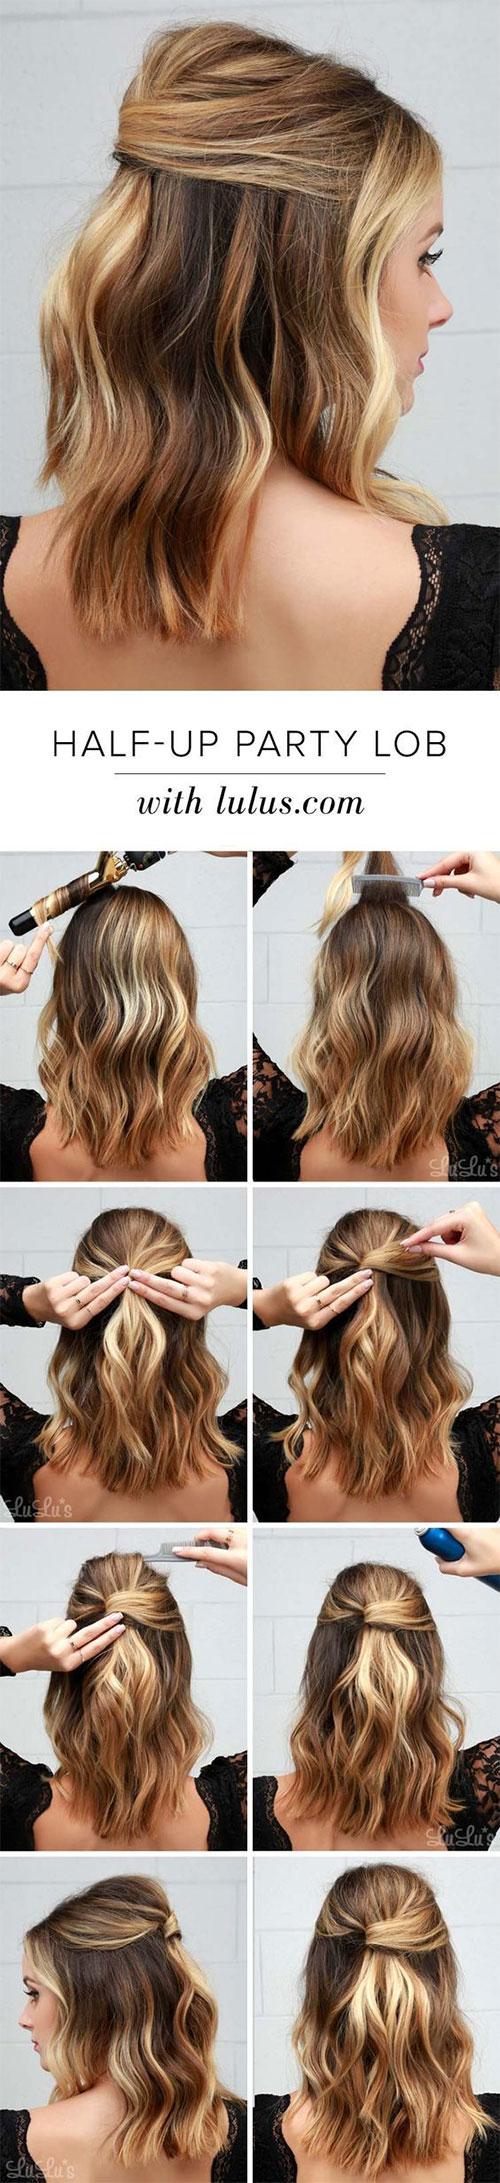 Half up hairstyle tutorials for short hair hacks tutorials